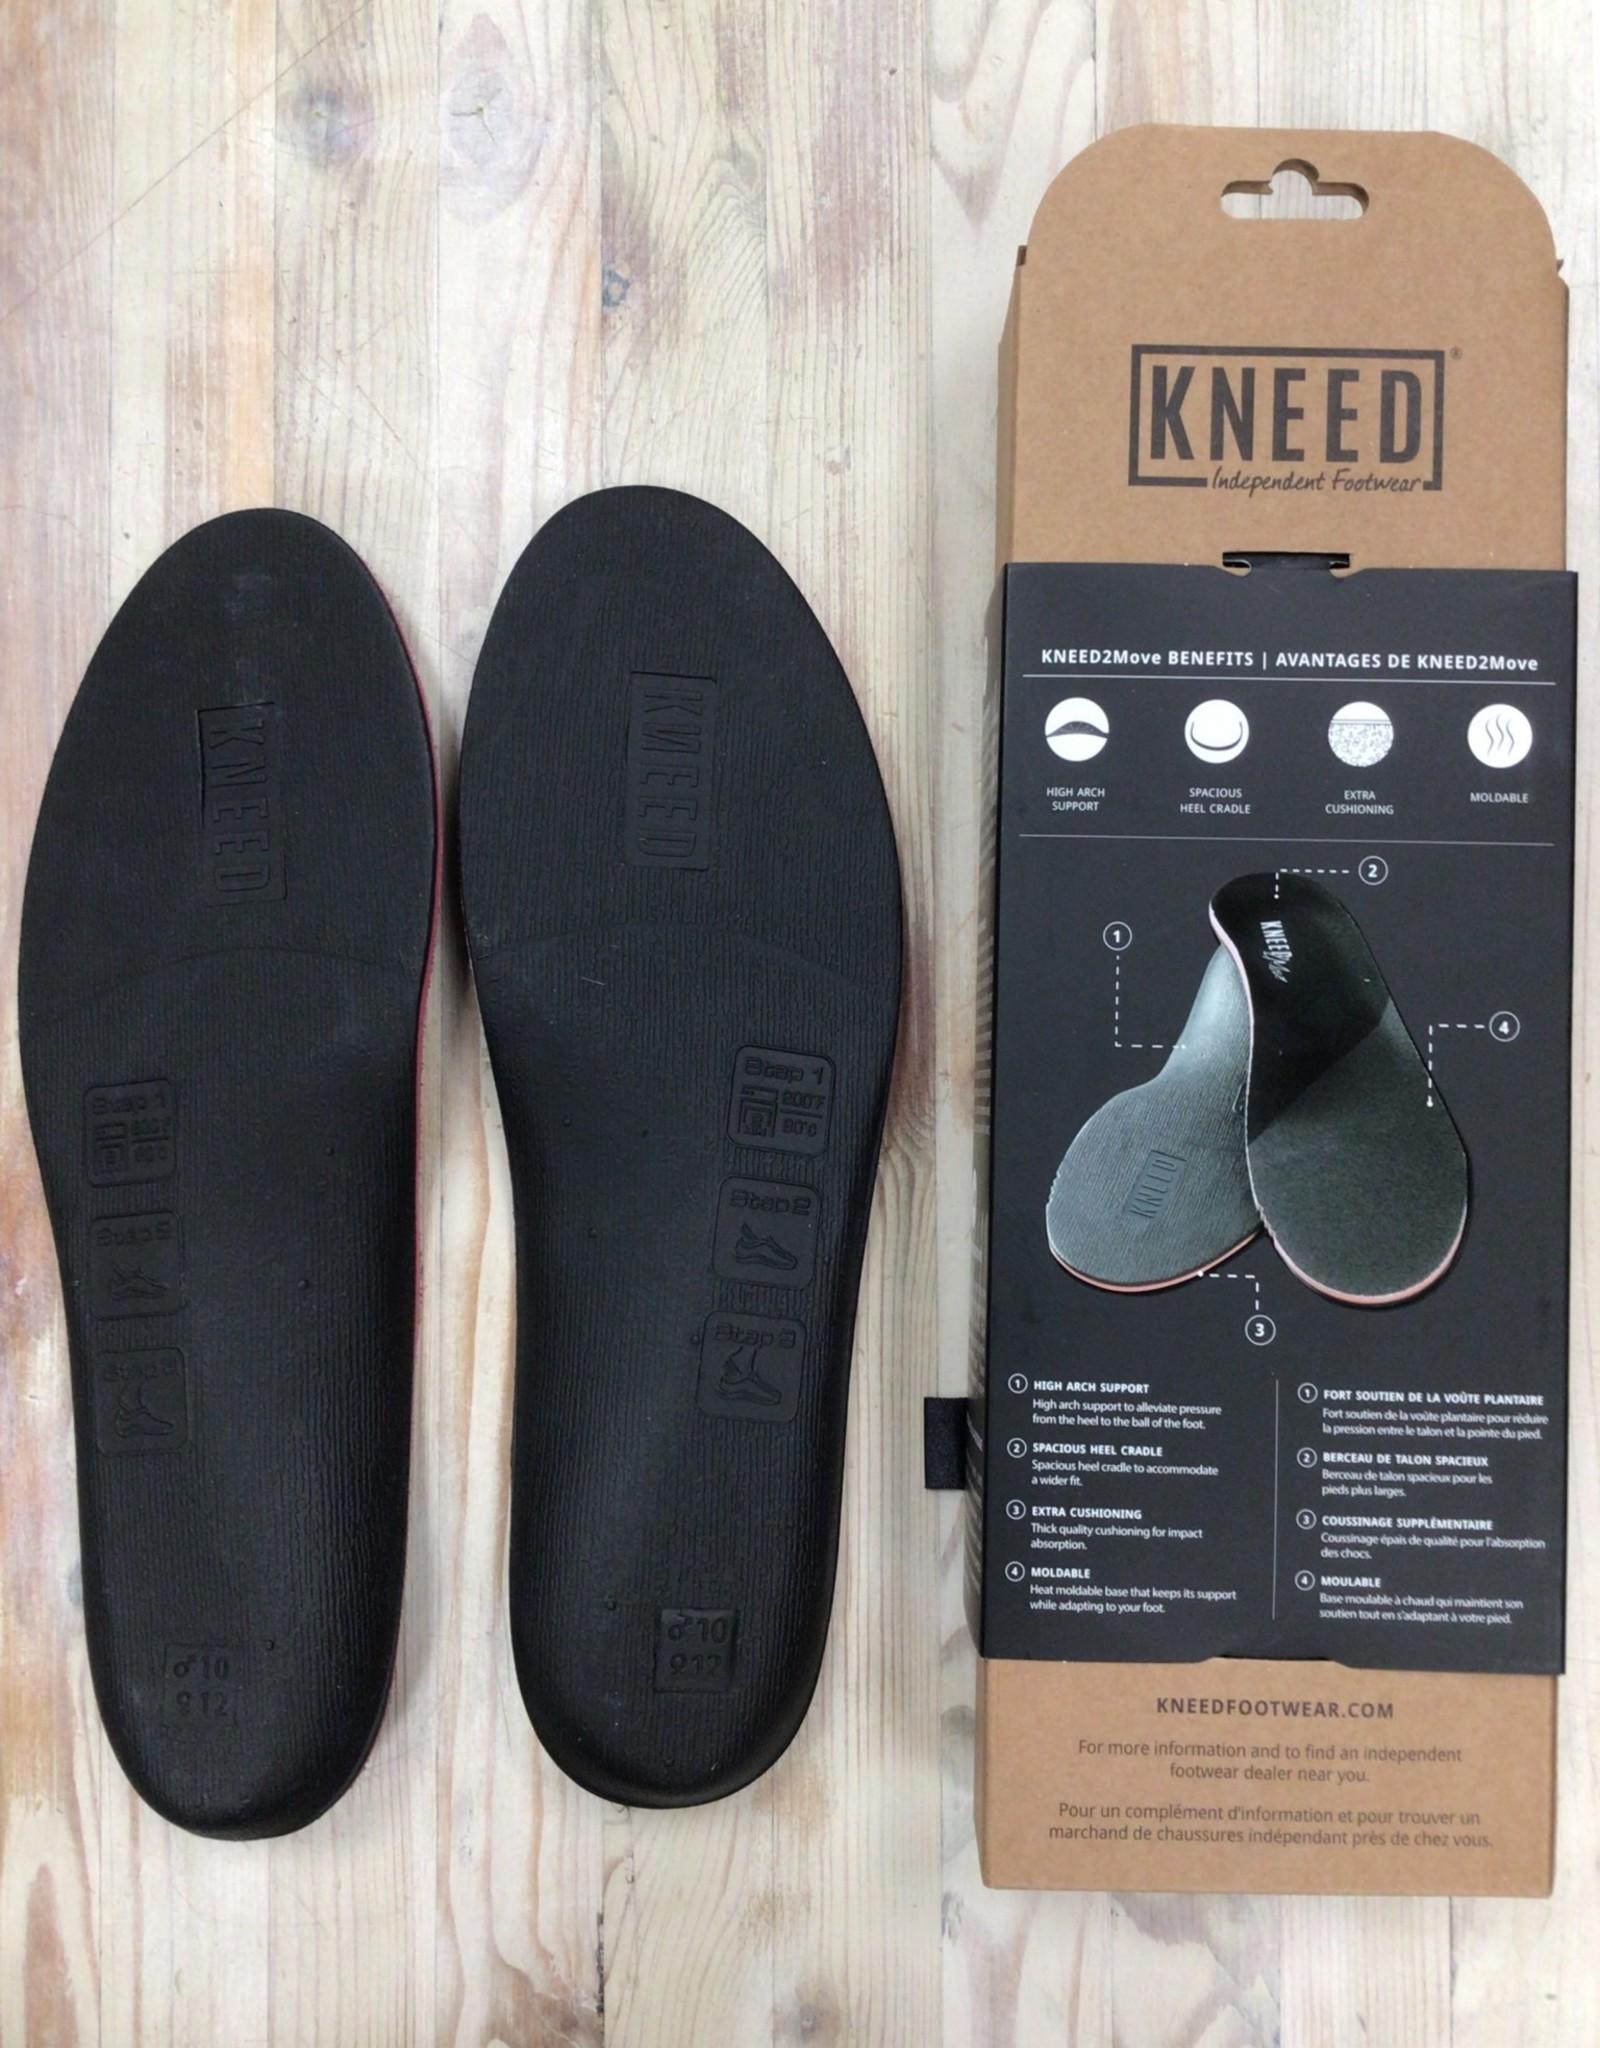 Kneed Footwear Kneed 2Move Insoles